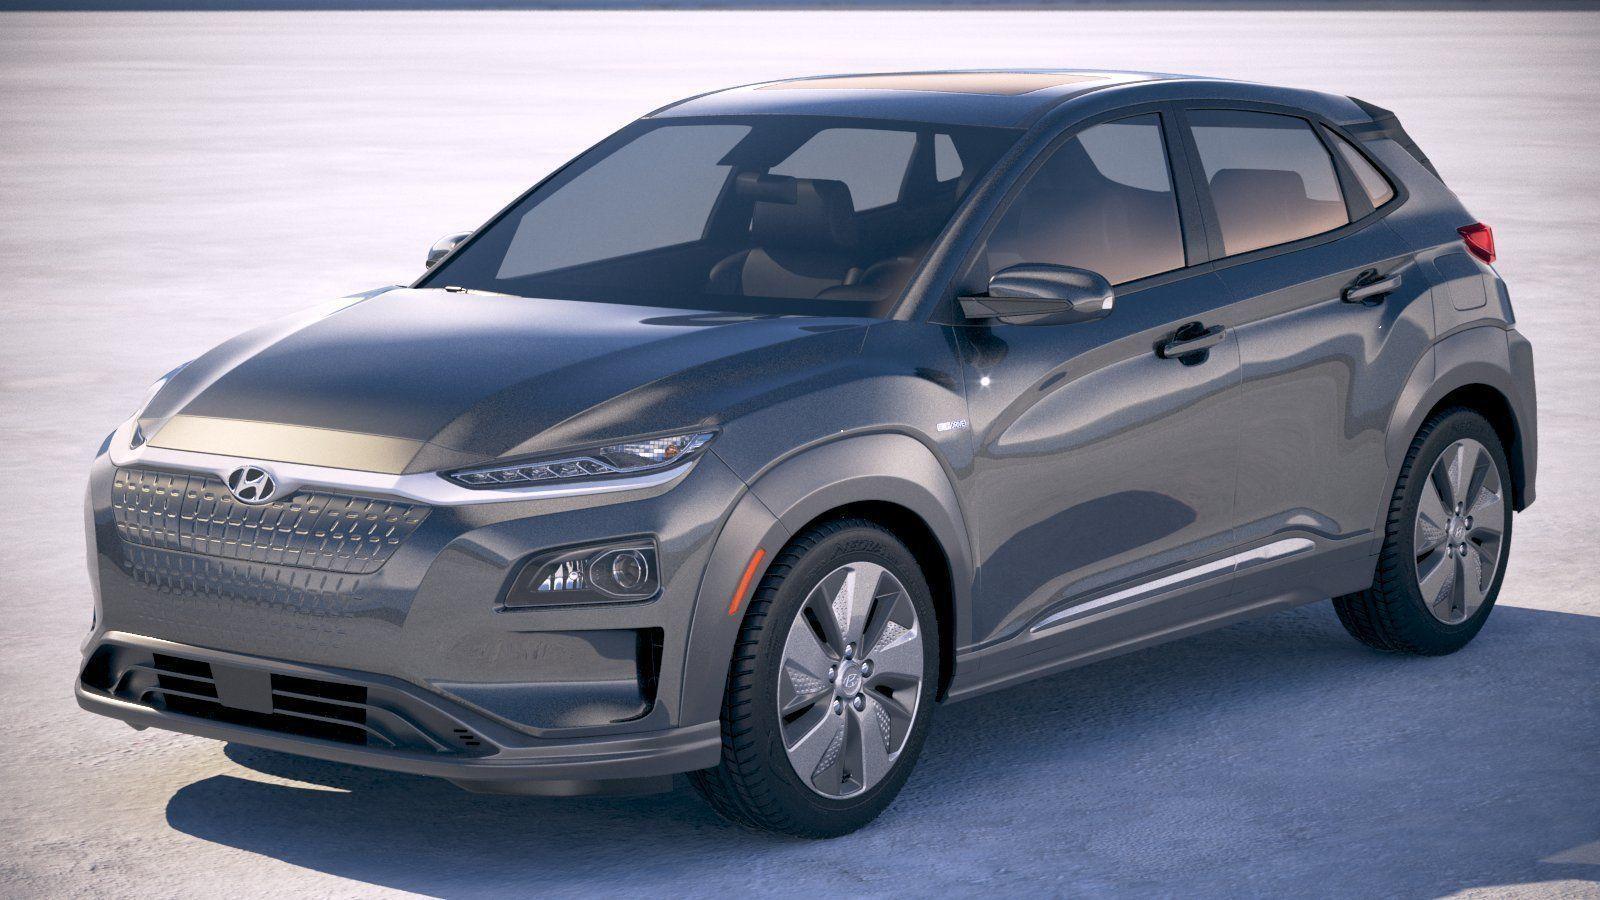 Hyundai Kona Electric 2019 3d Cgtrader